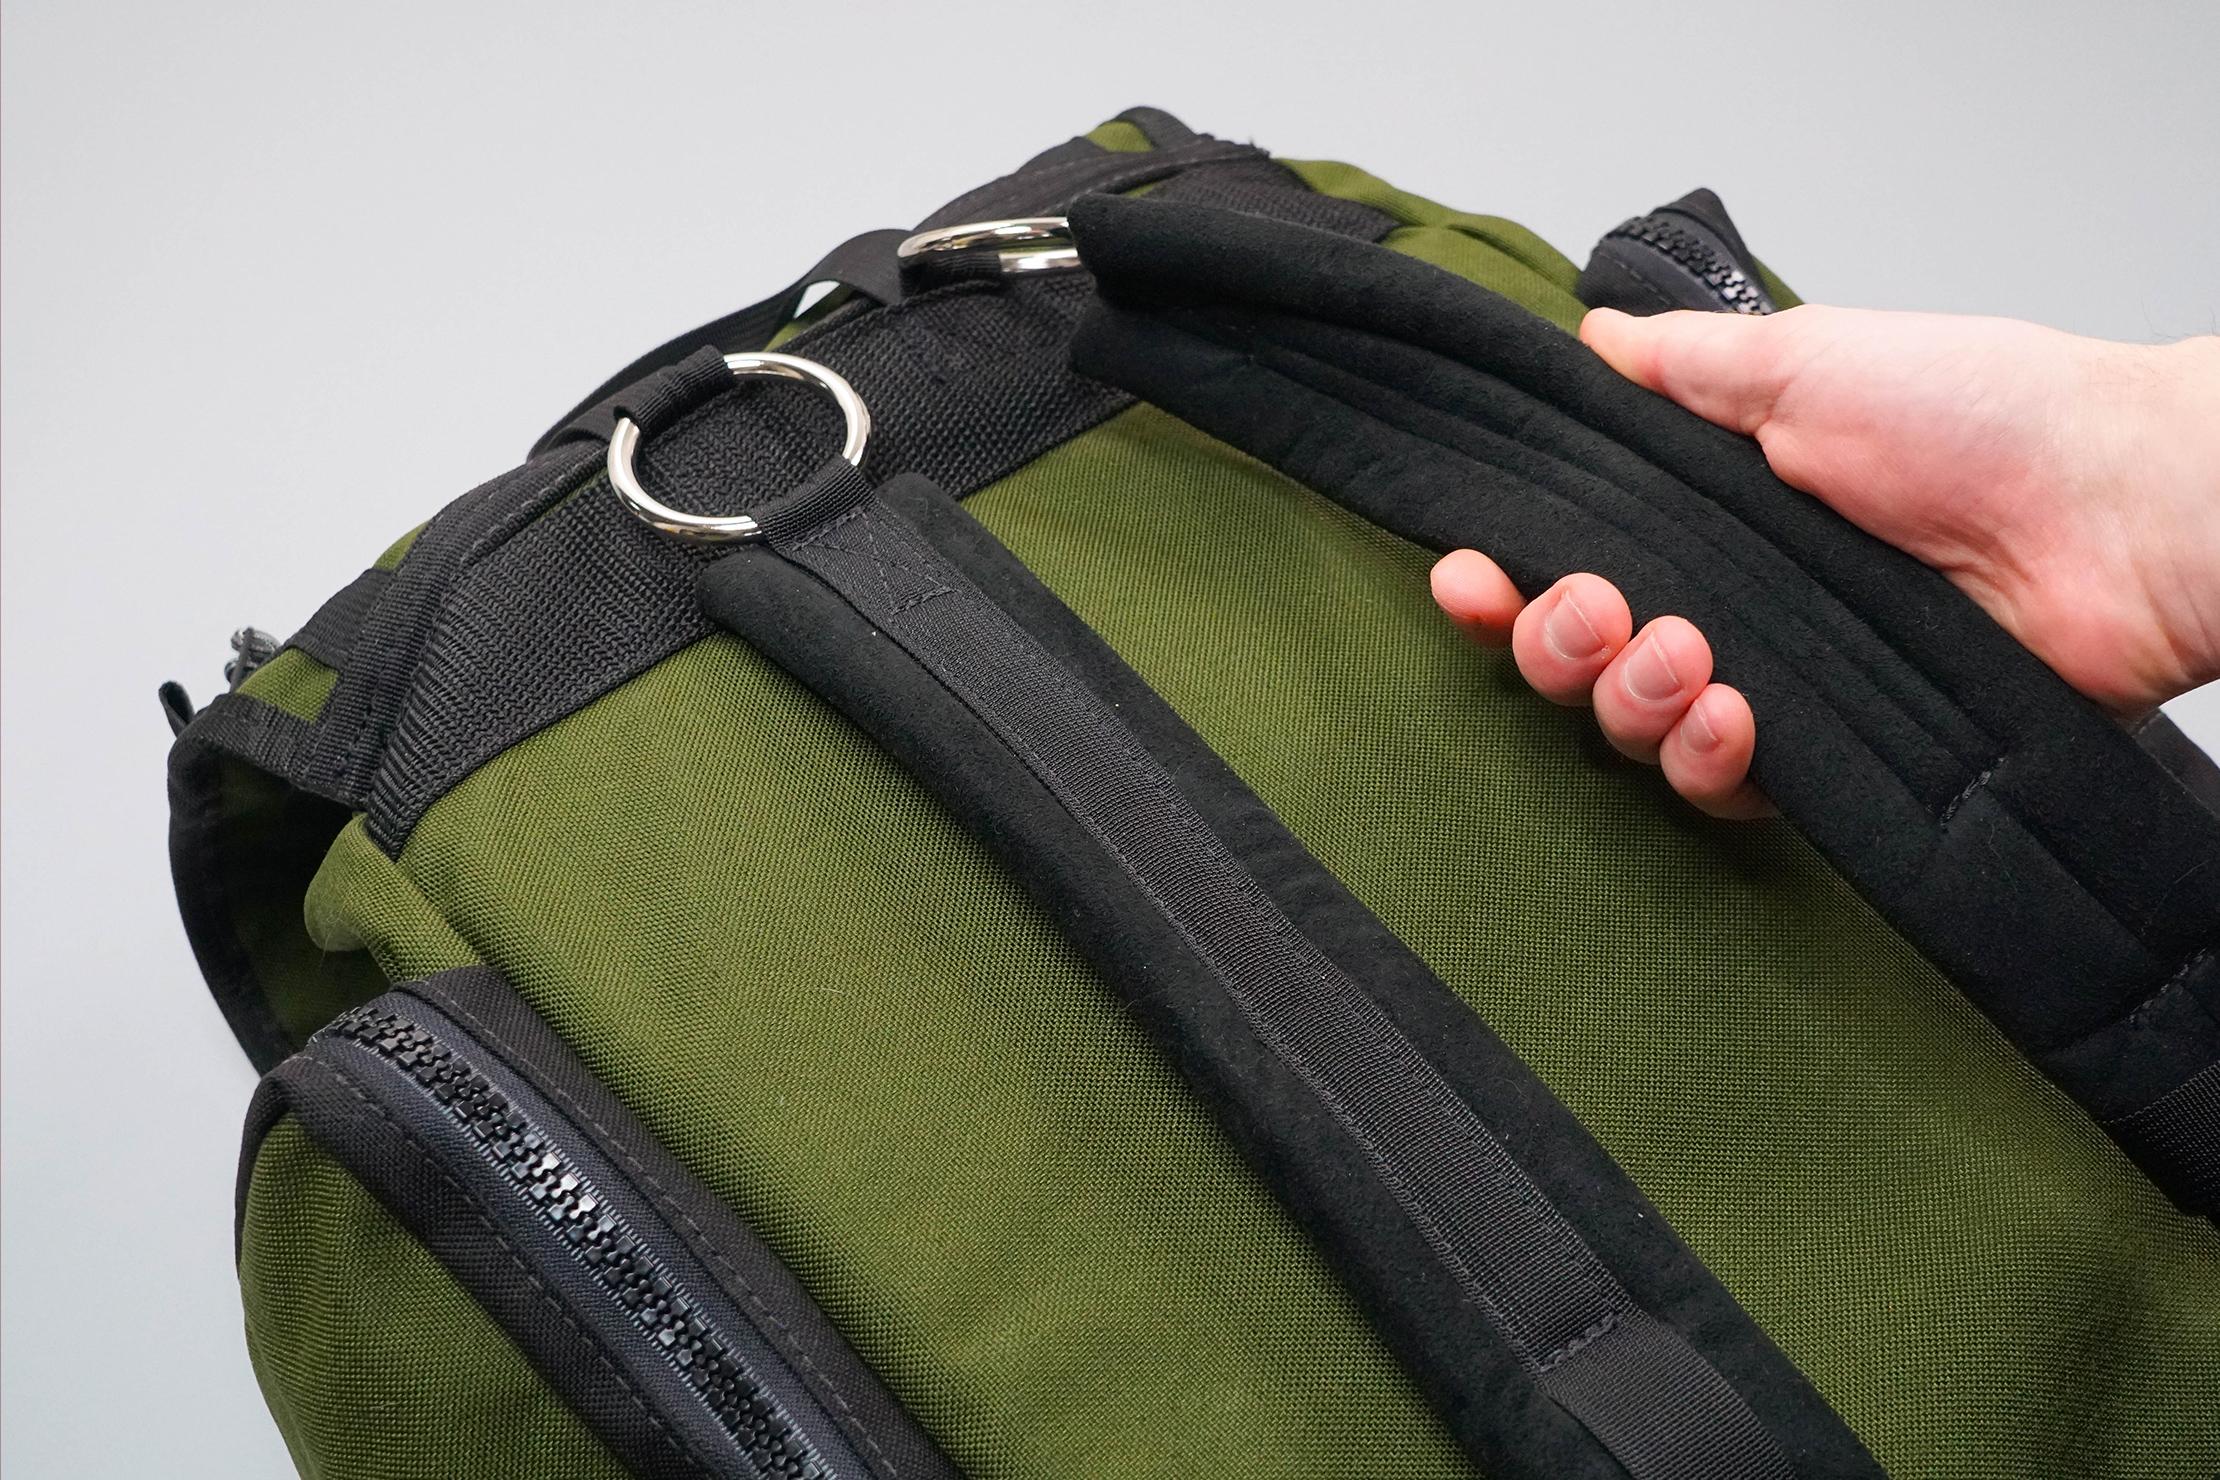 Red Oxx C-Ruck Carry-On Rucksack Shoulder Straps